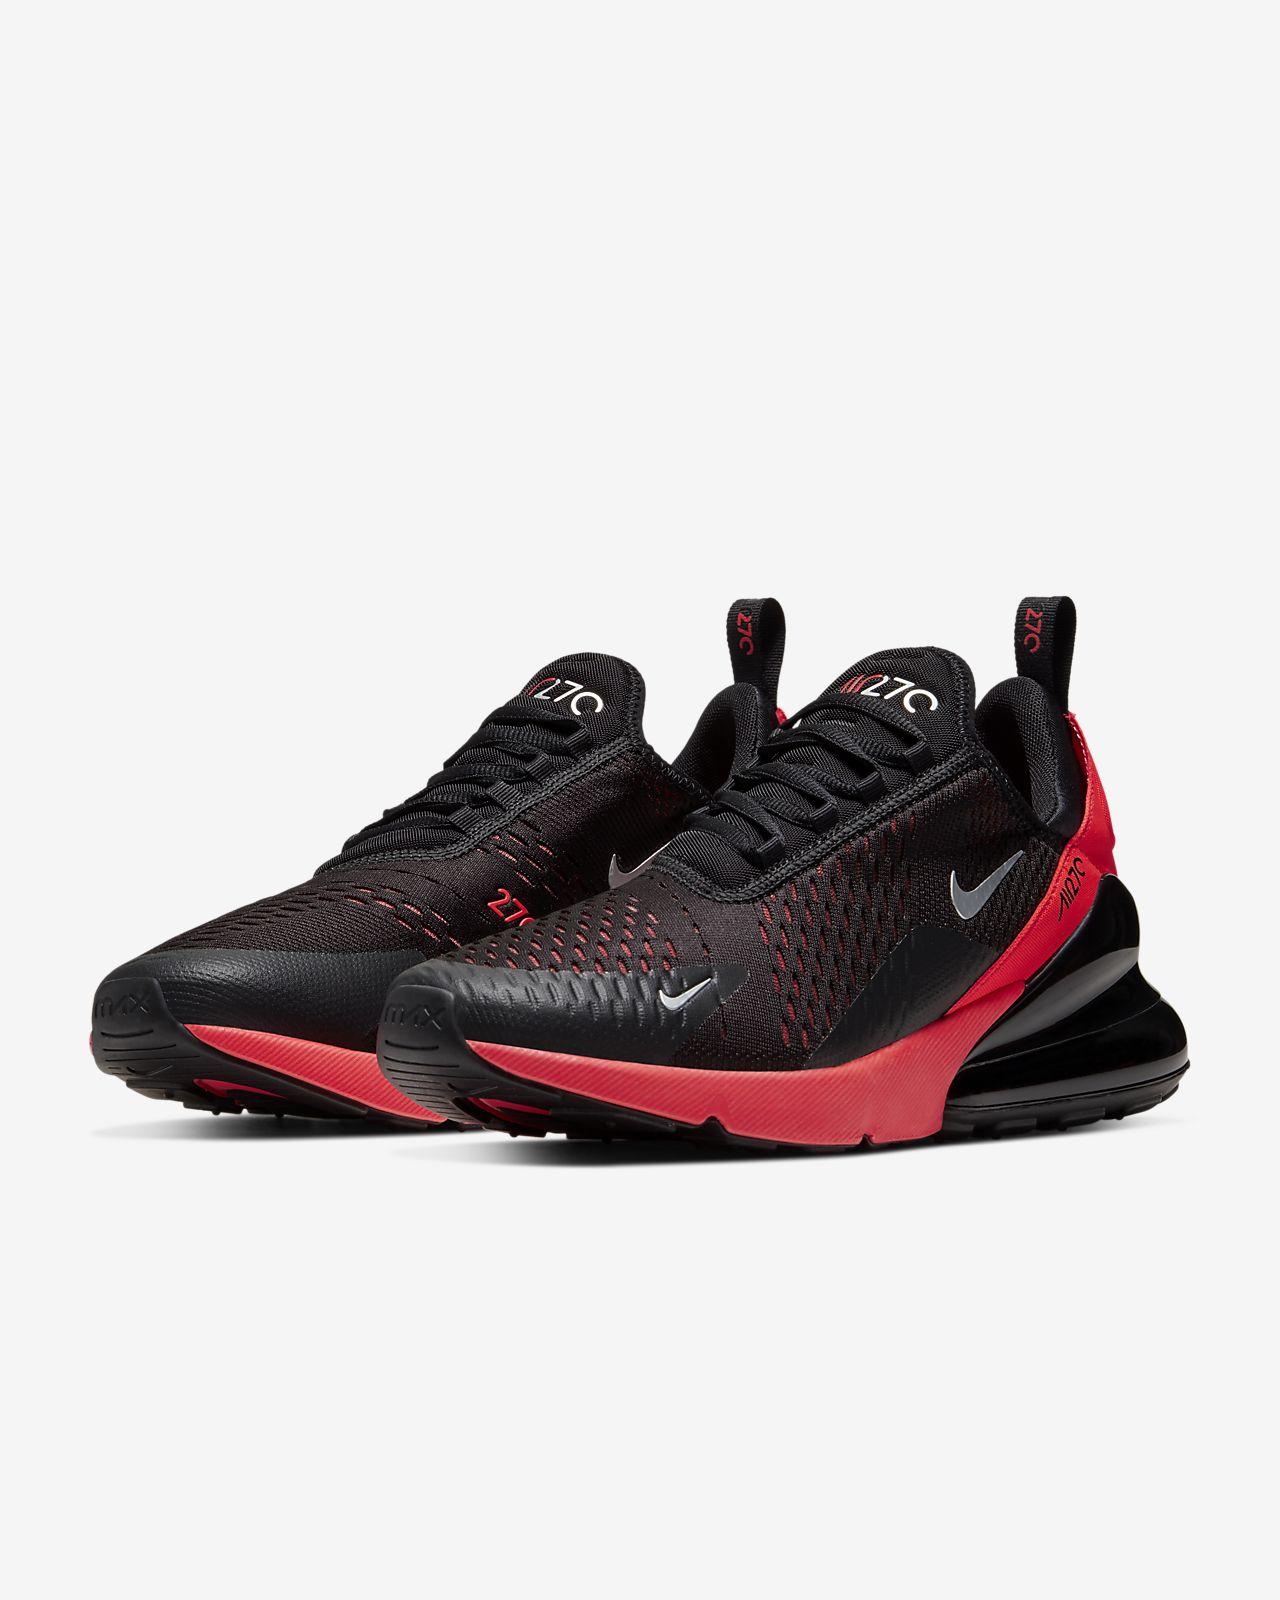 scarpe nike c27 78% di sconto trevisomtb.it